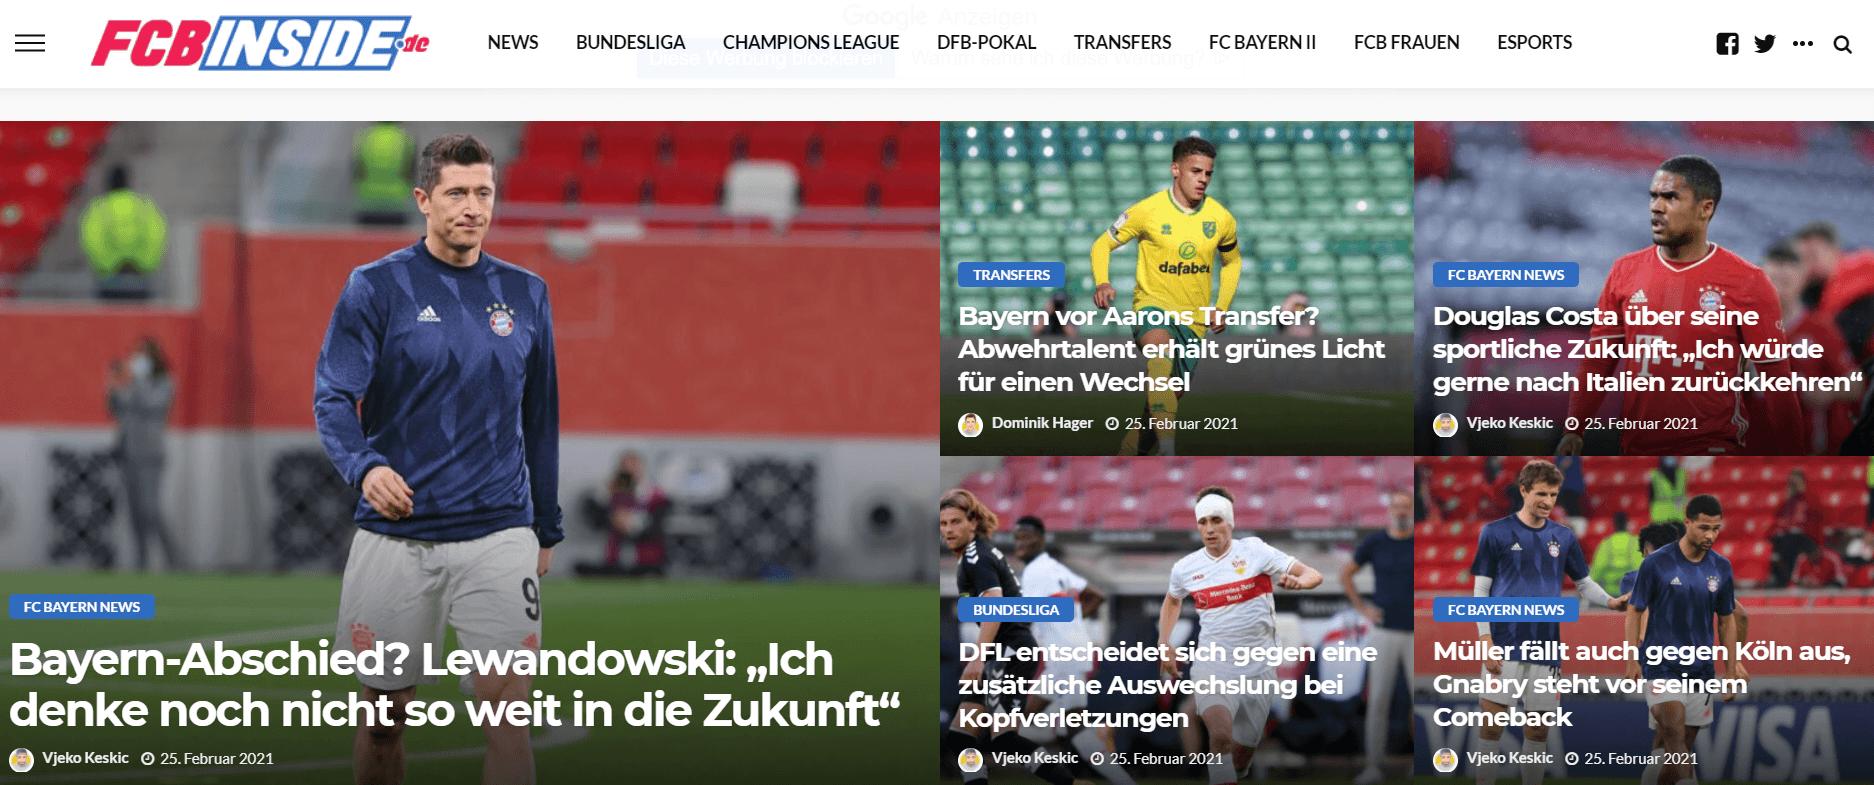 Website des Fußballblogs fcbinside.de